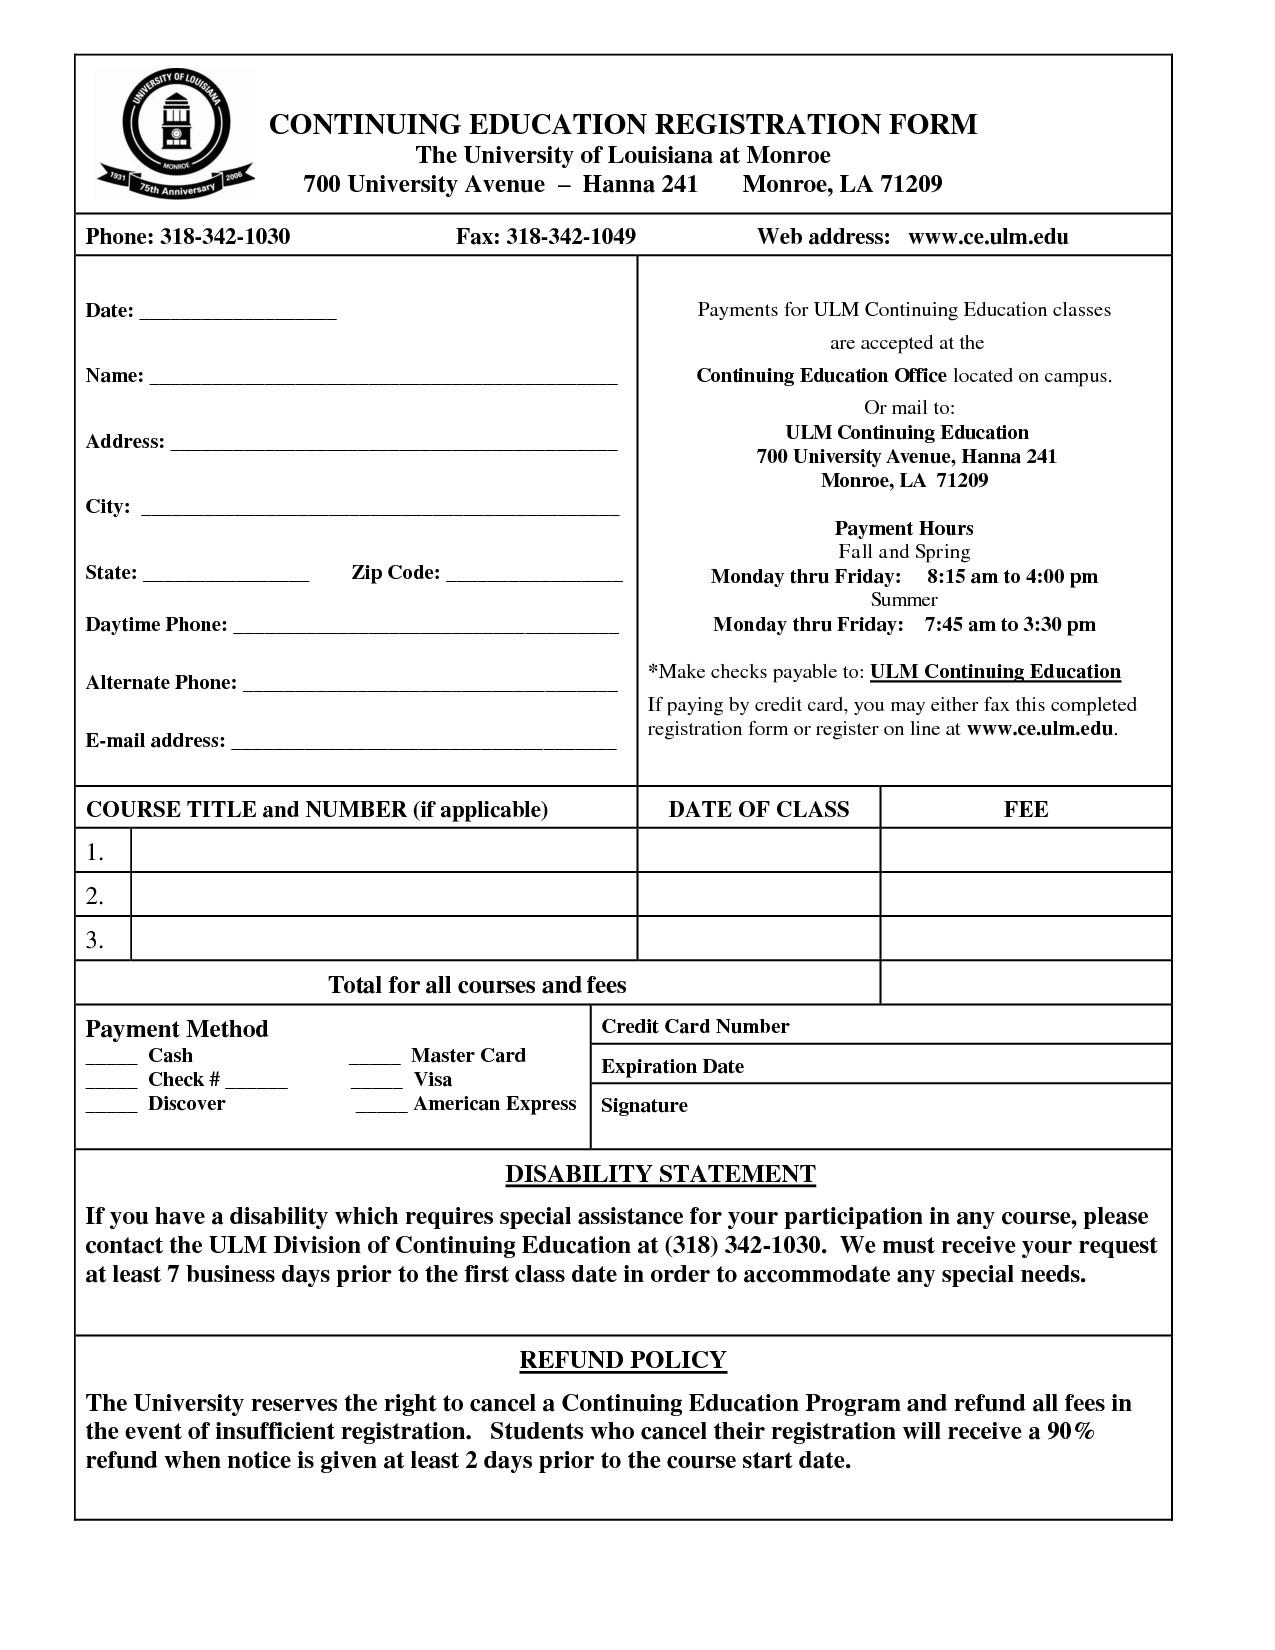 Registration form Template Microsoft Word Registration form Template Word